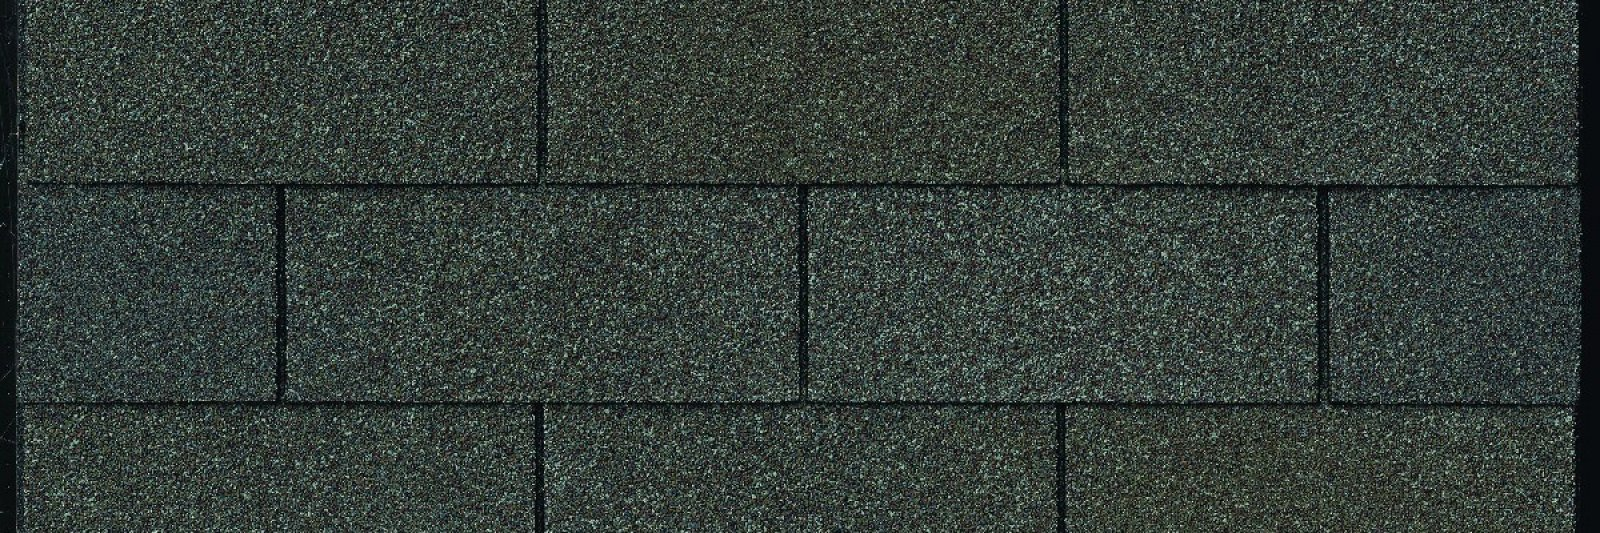 Nickel Gray image